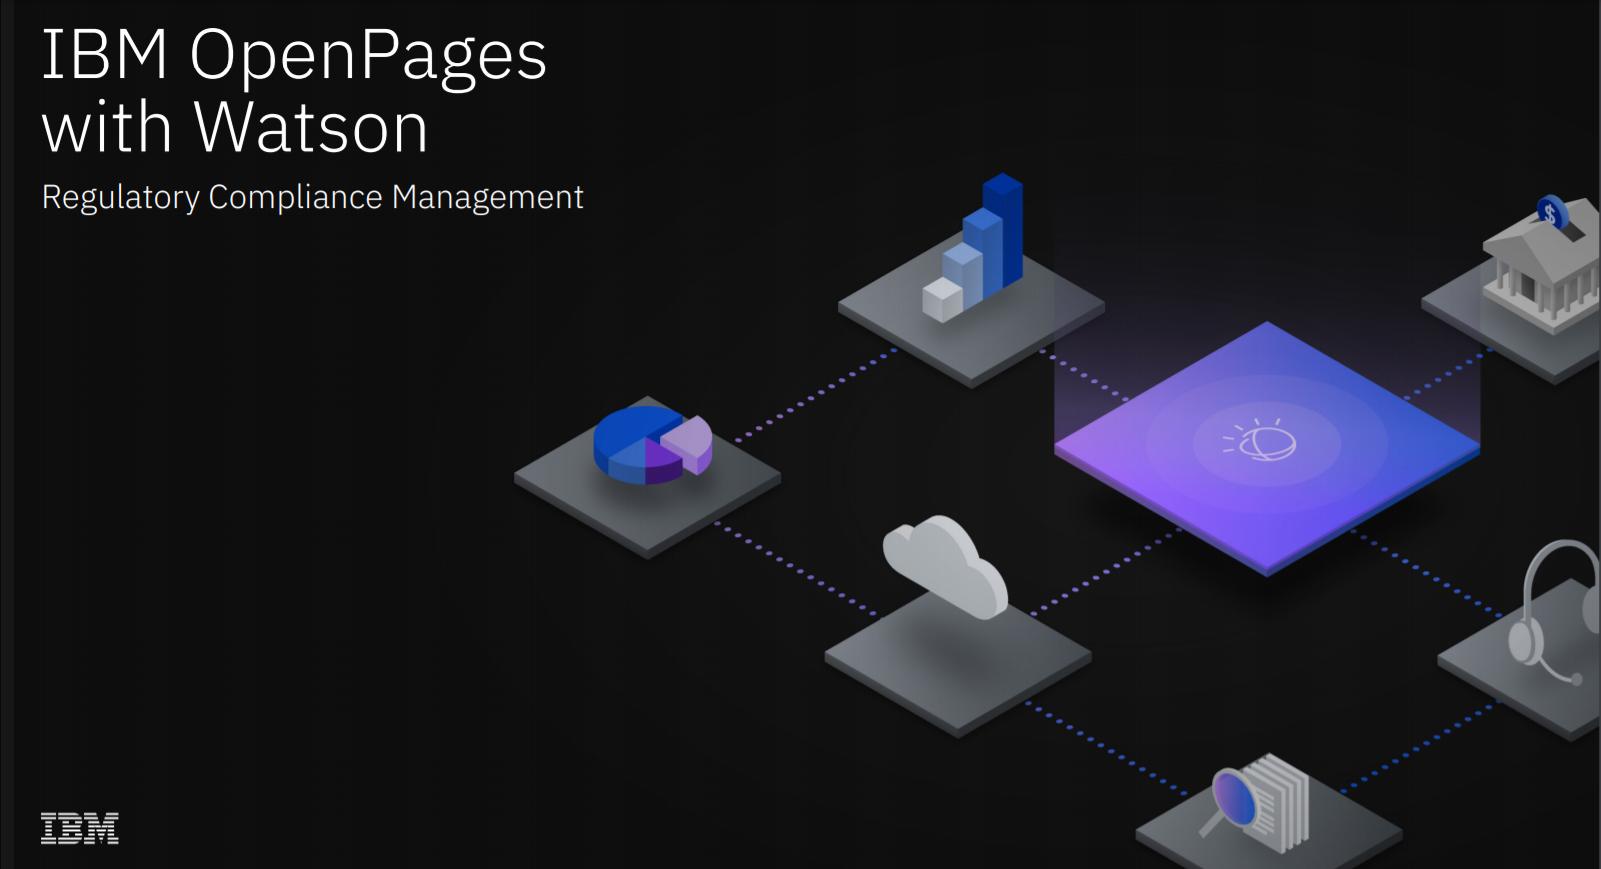 IBM OpenPages Regulatory Compliance Management Software